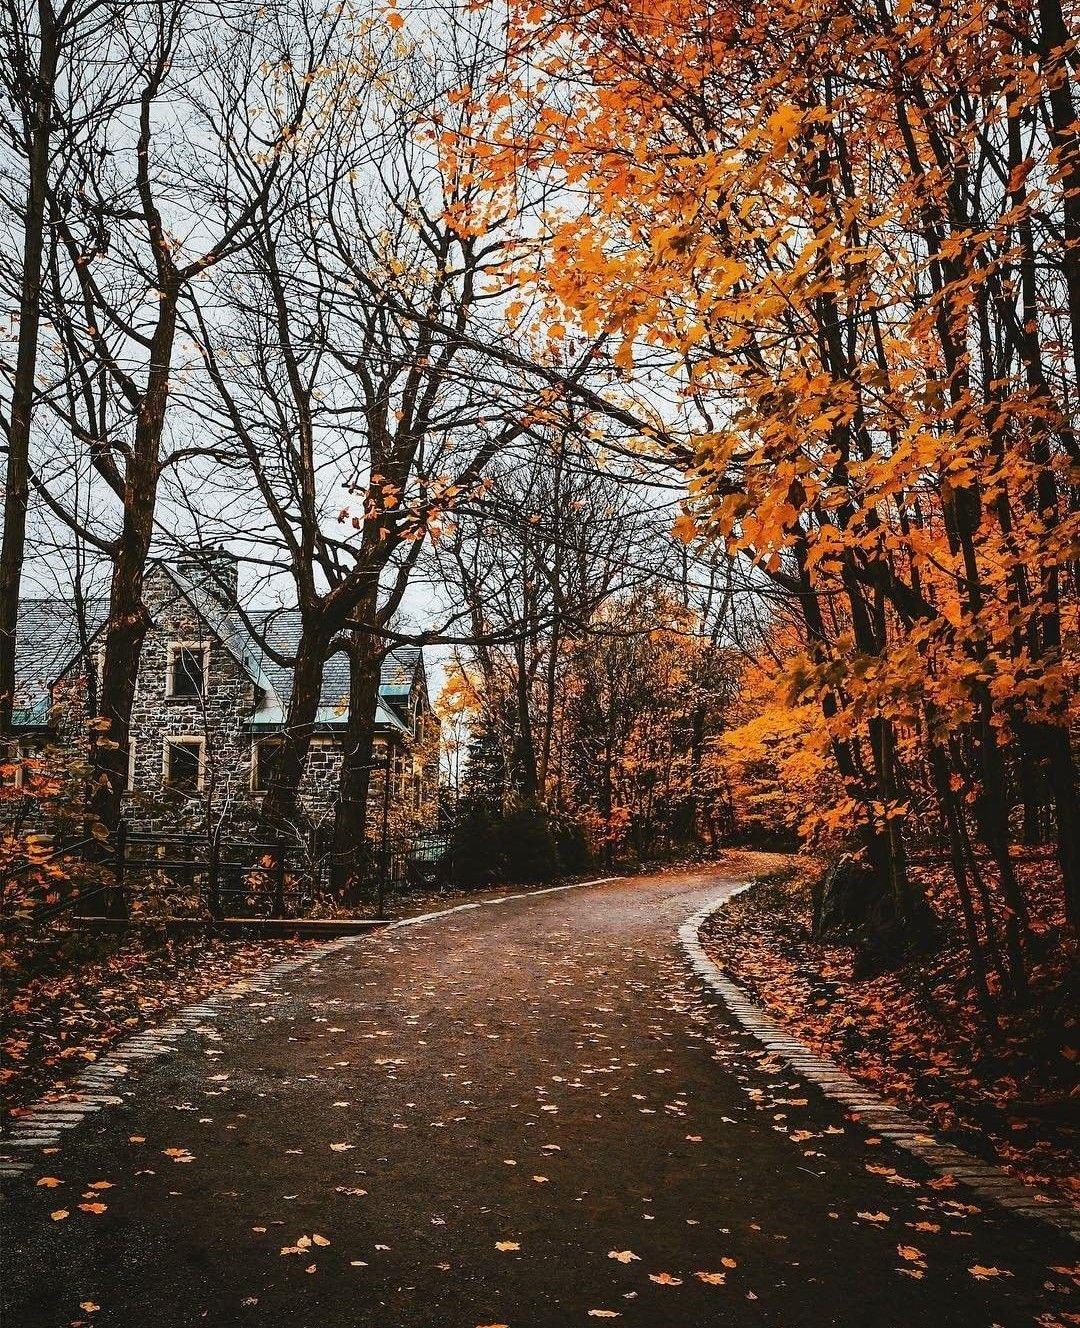 Autumn Cozy, Scenery, Autumn Photography